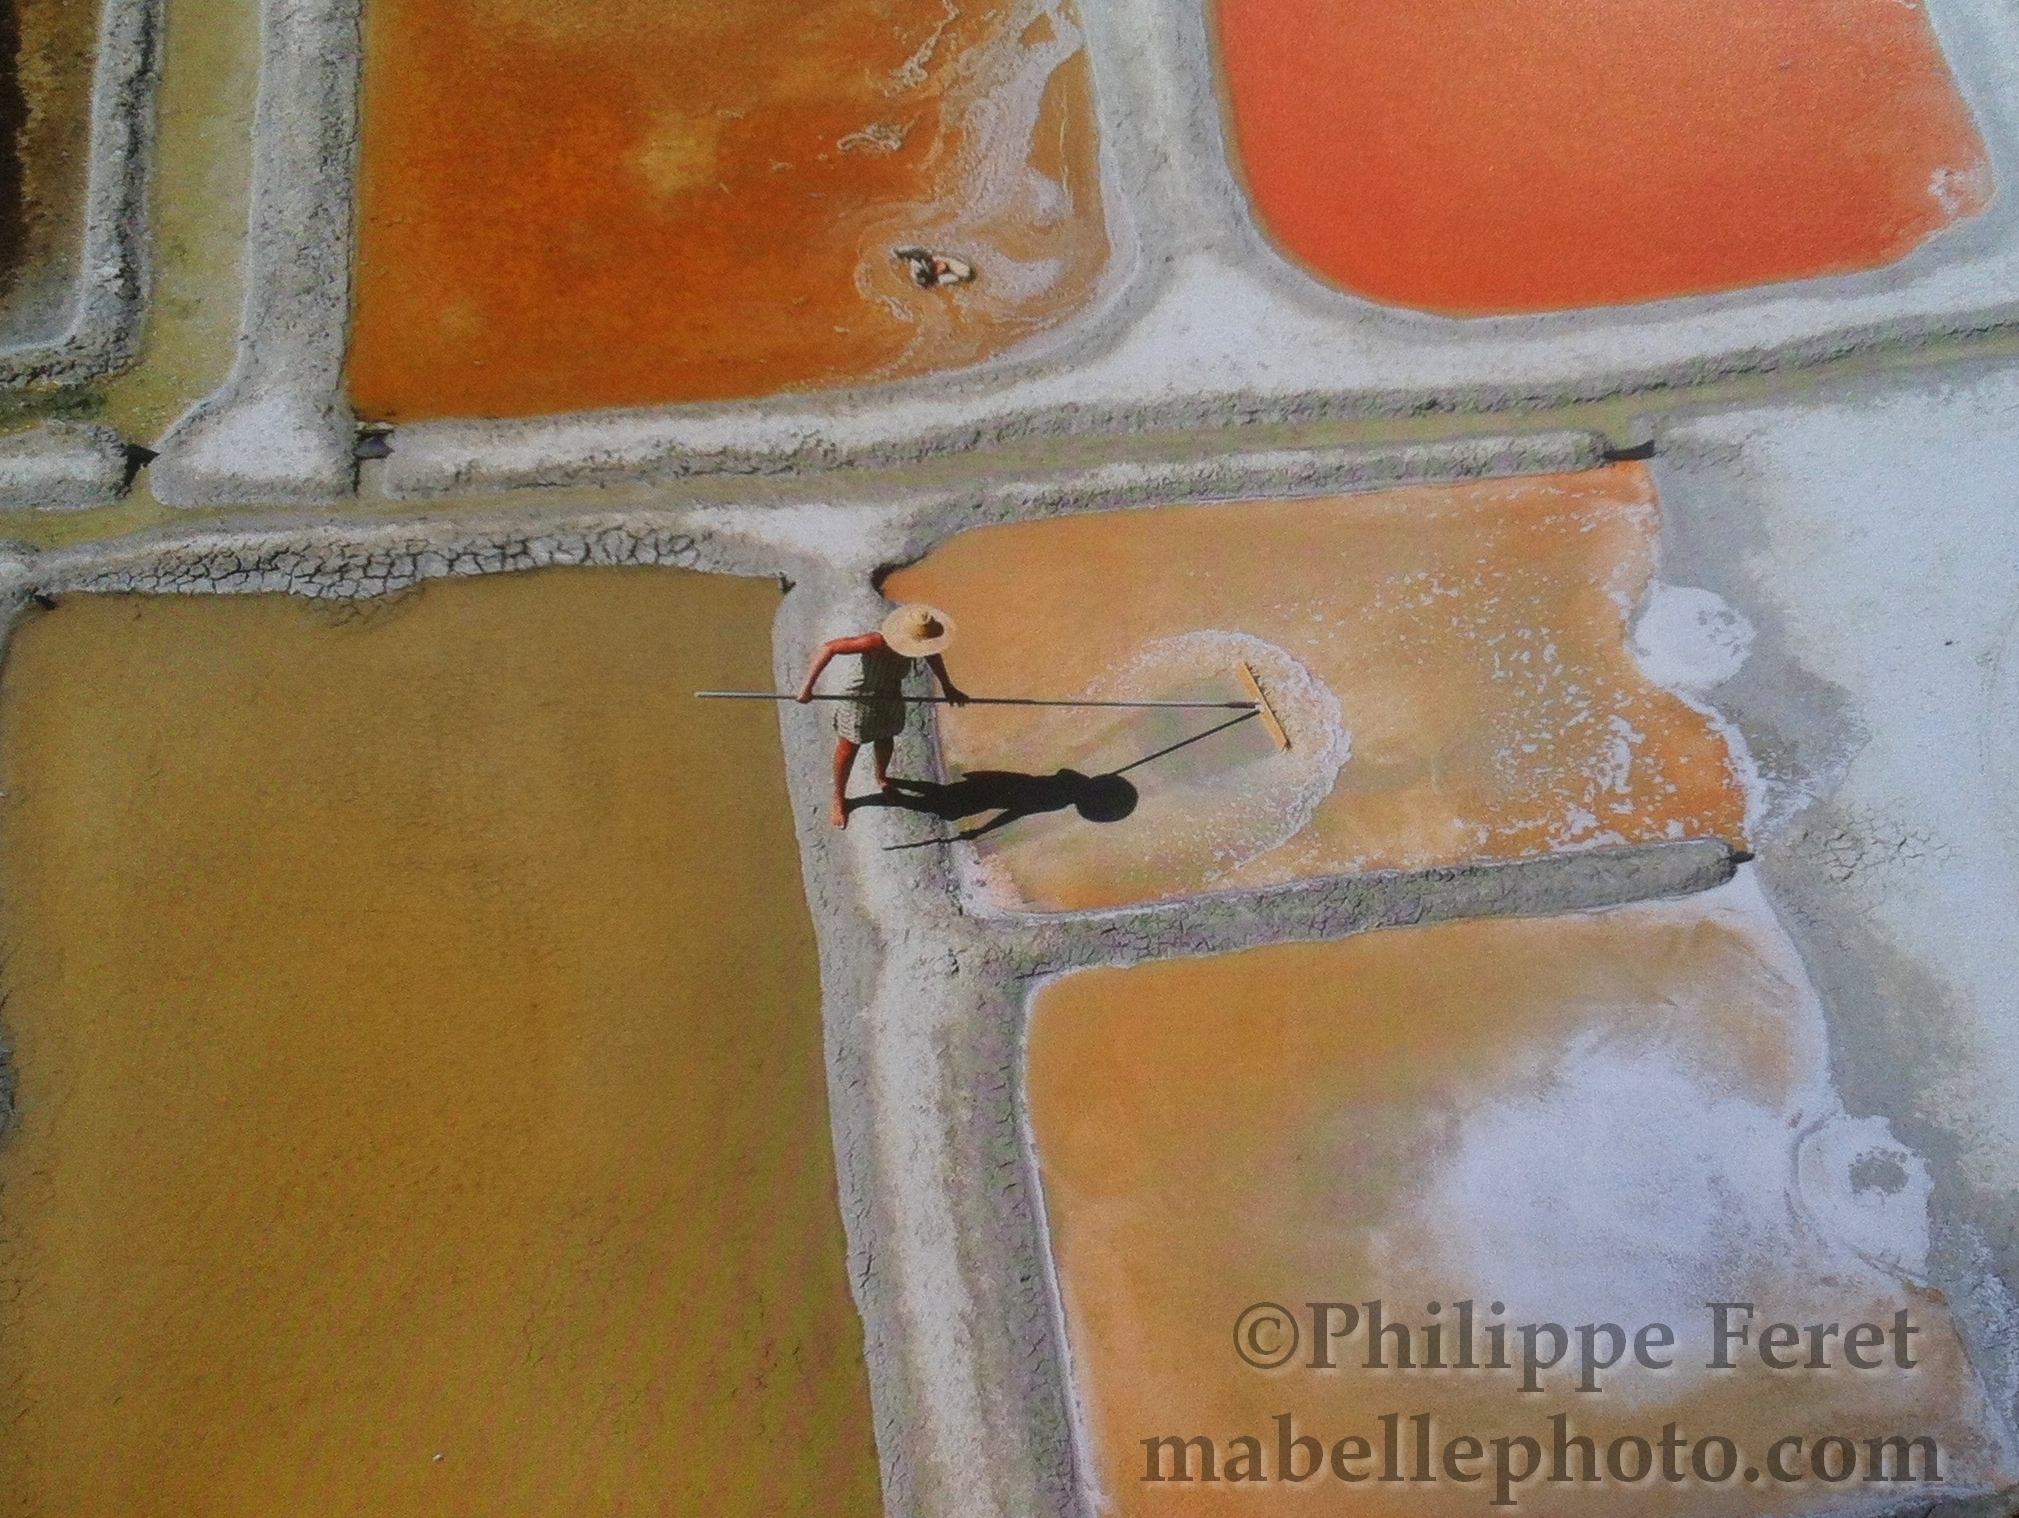 carte-postale-sauniere-michele-marais-ile-de-re-1462733177.JPG